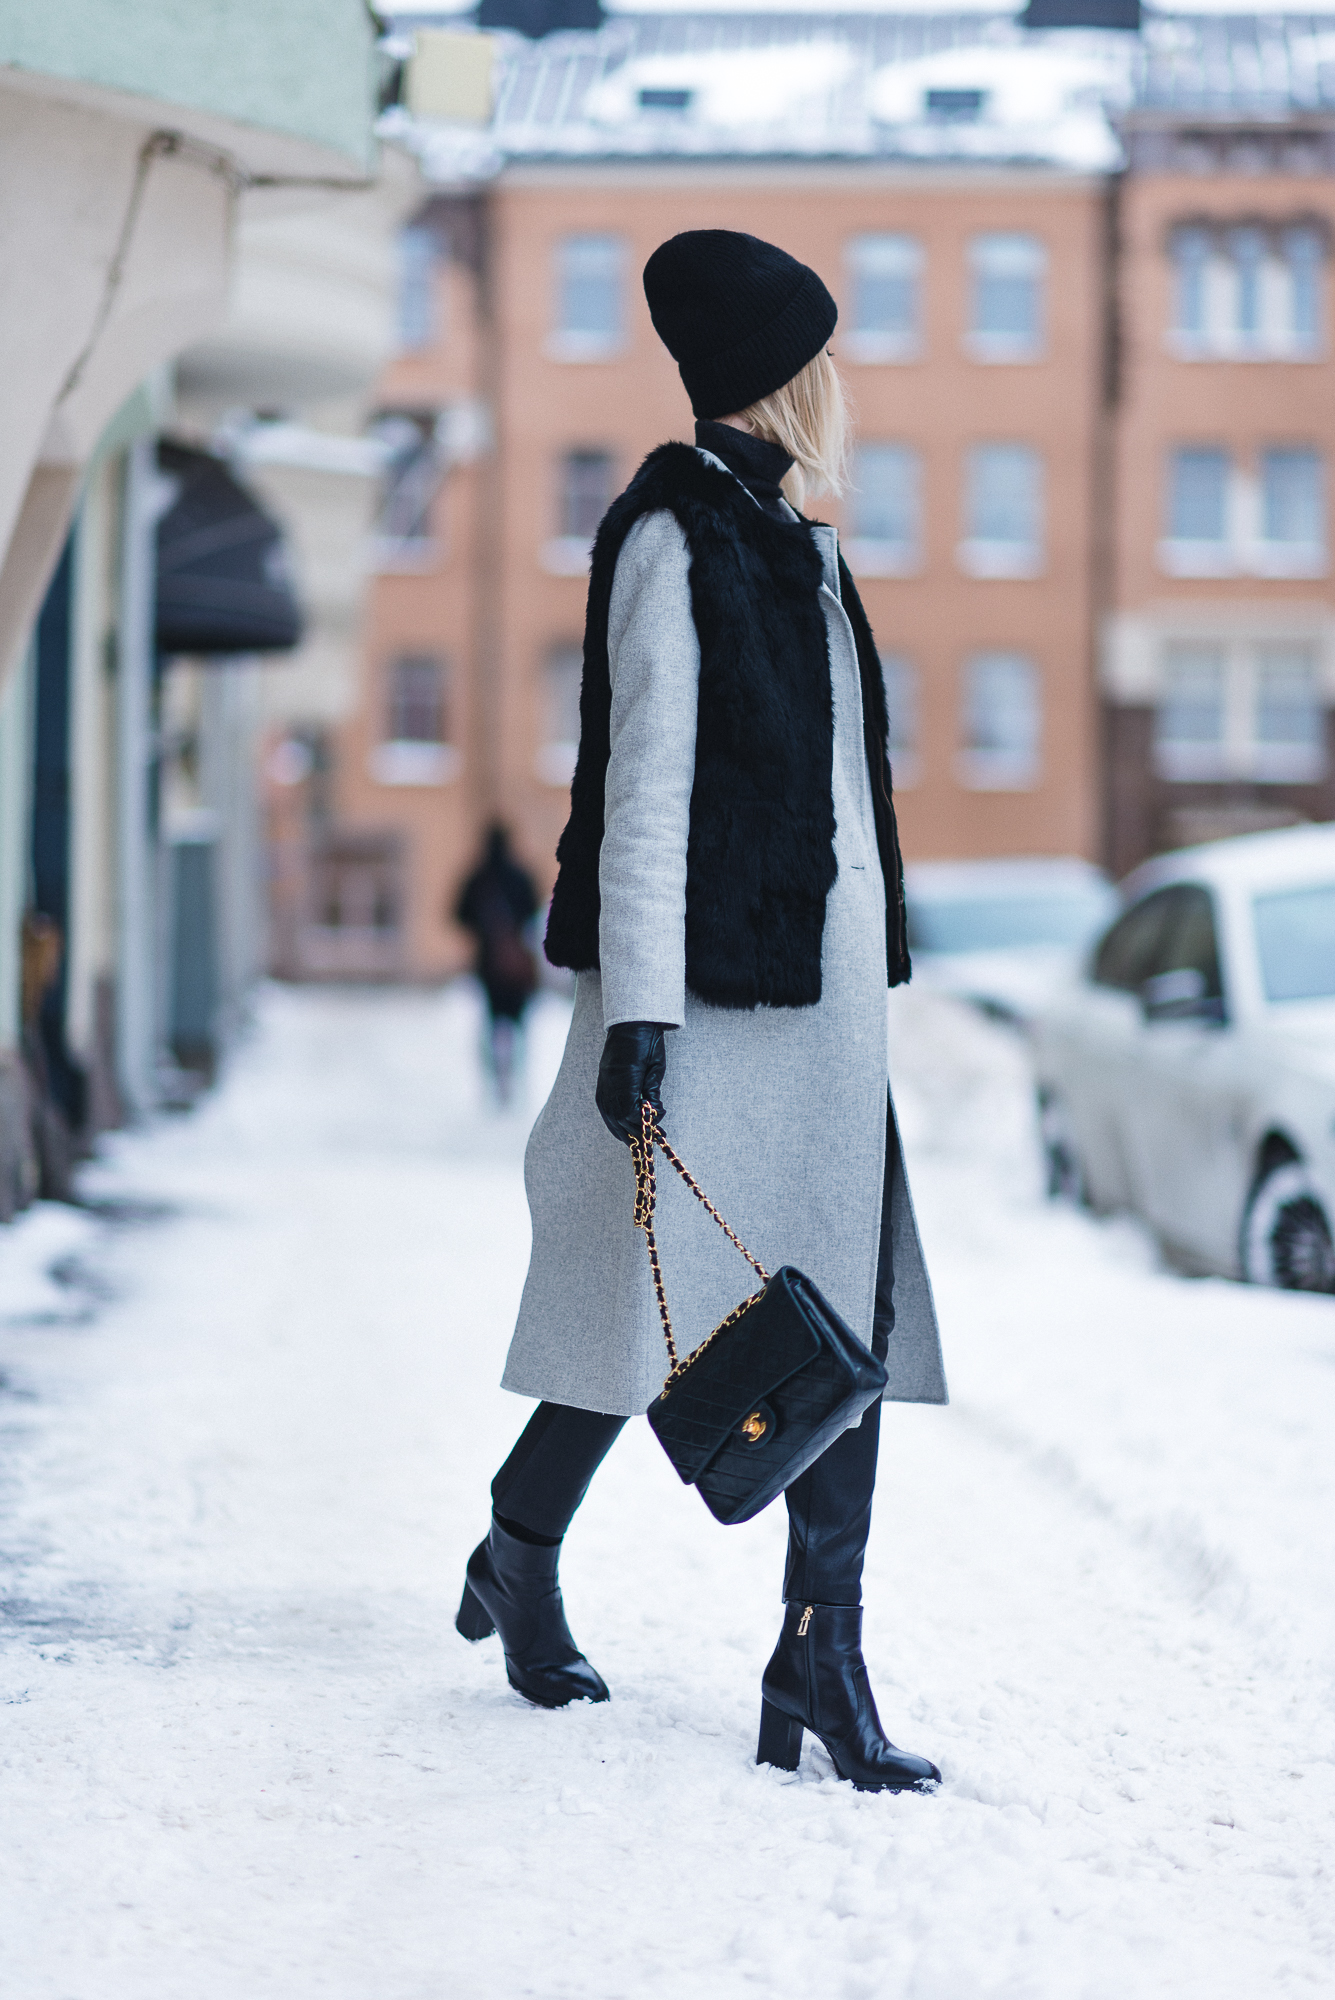 anna-sofia-helsinki-snow-chanel-bag-black-beanie-6